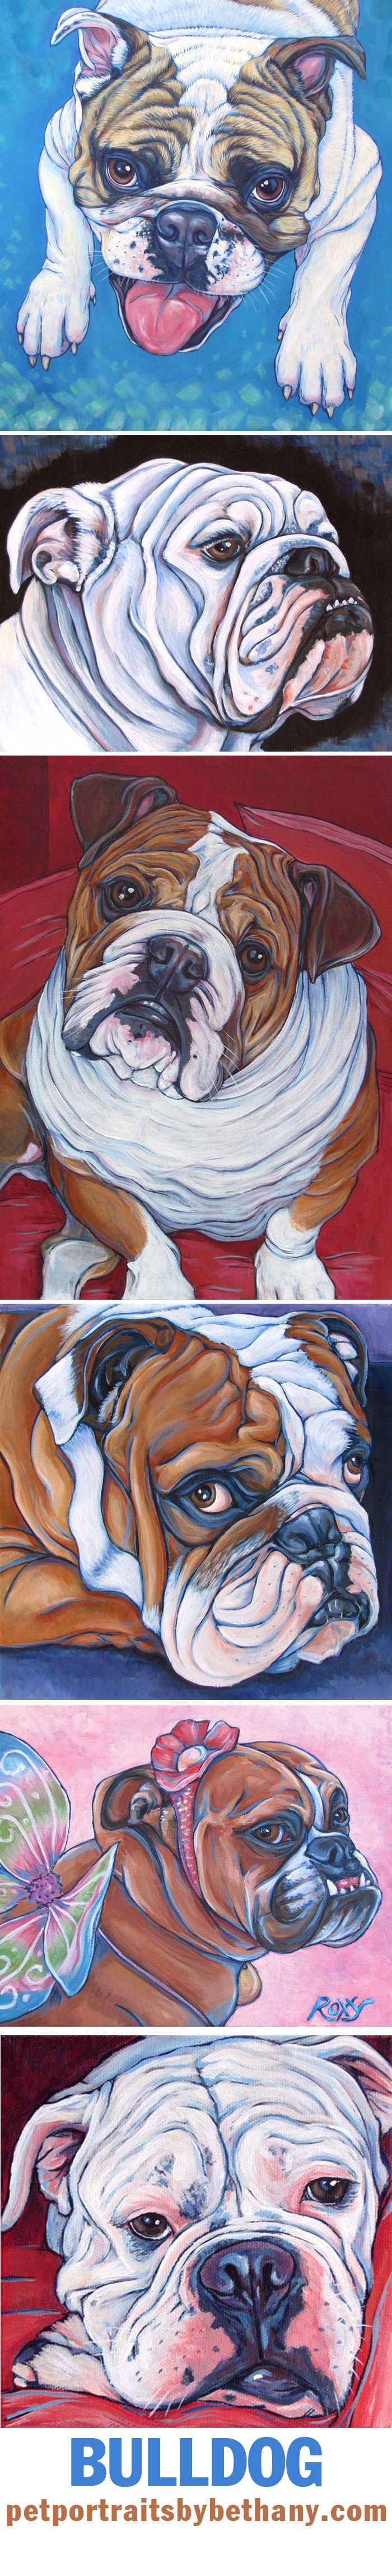 English Bulldog                                                                                                                                                                                 More